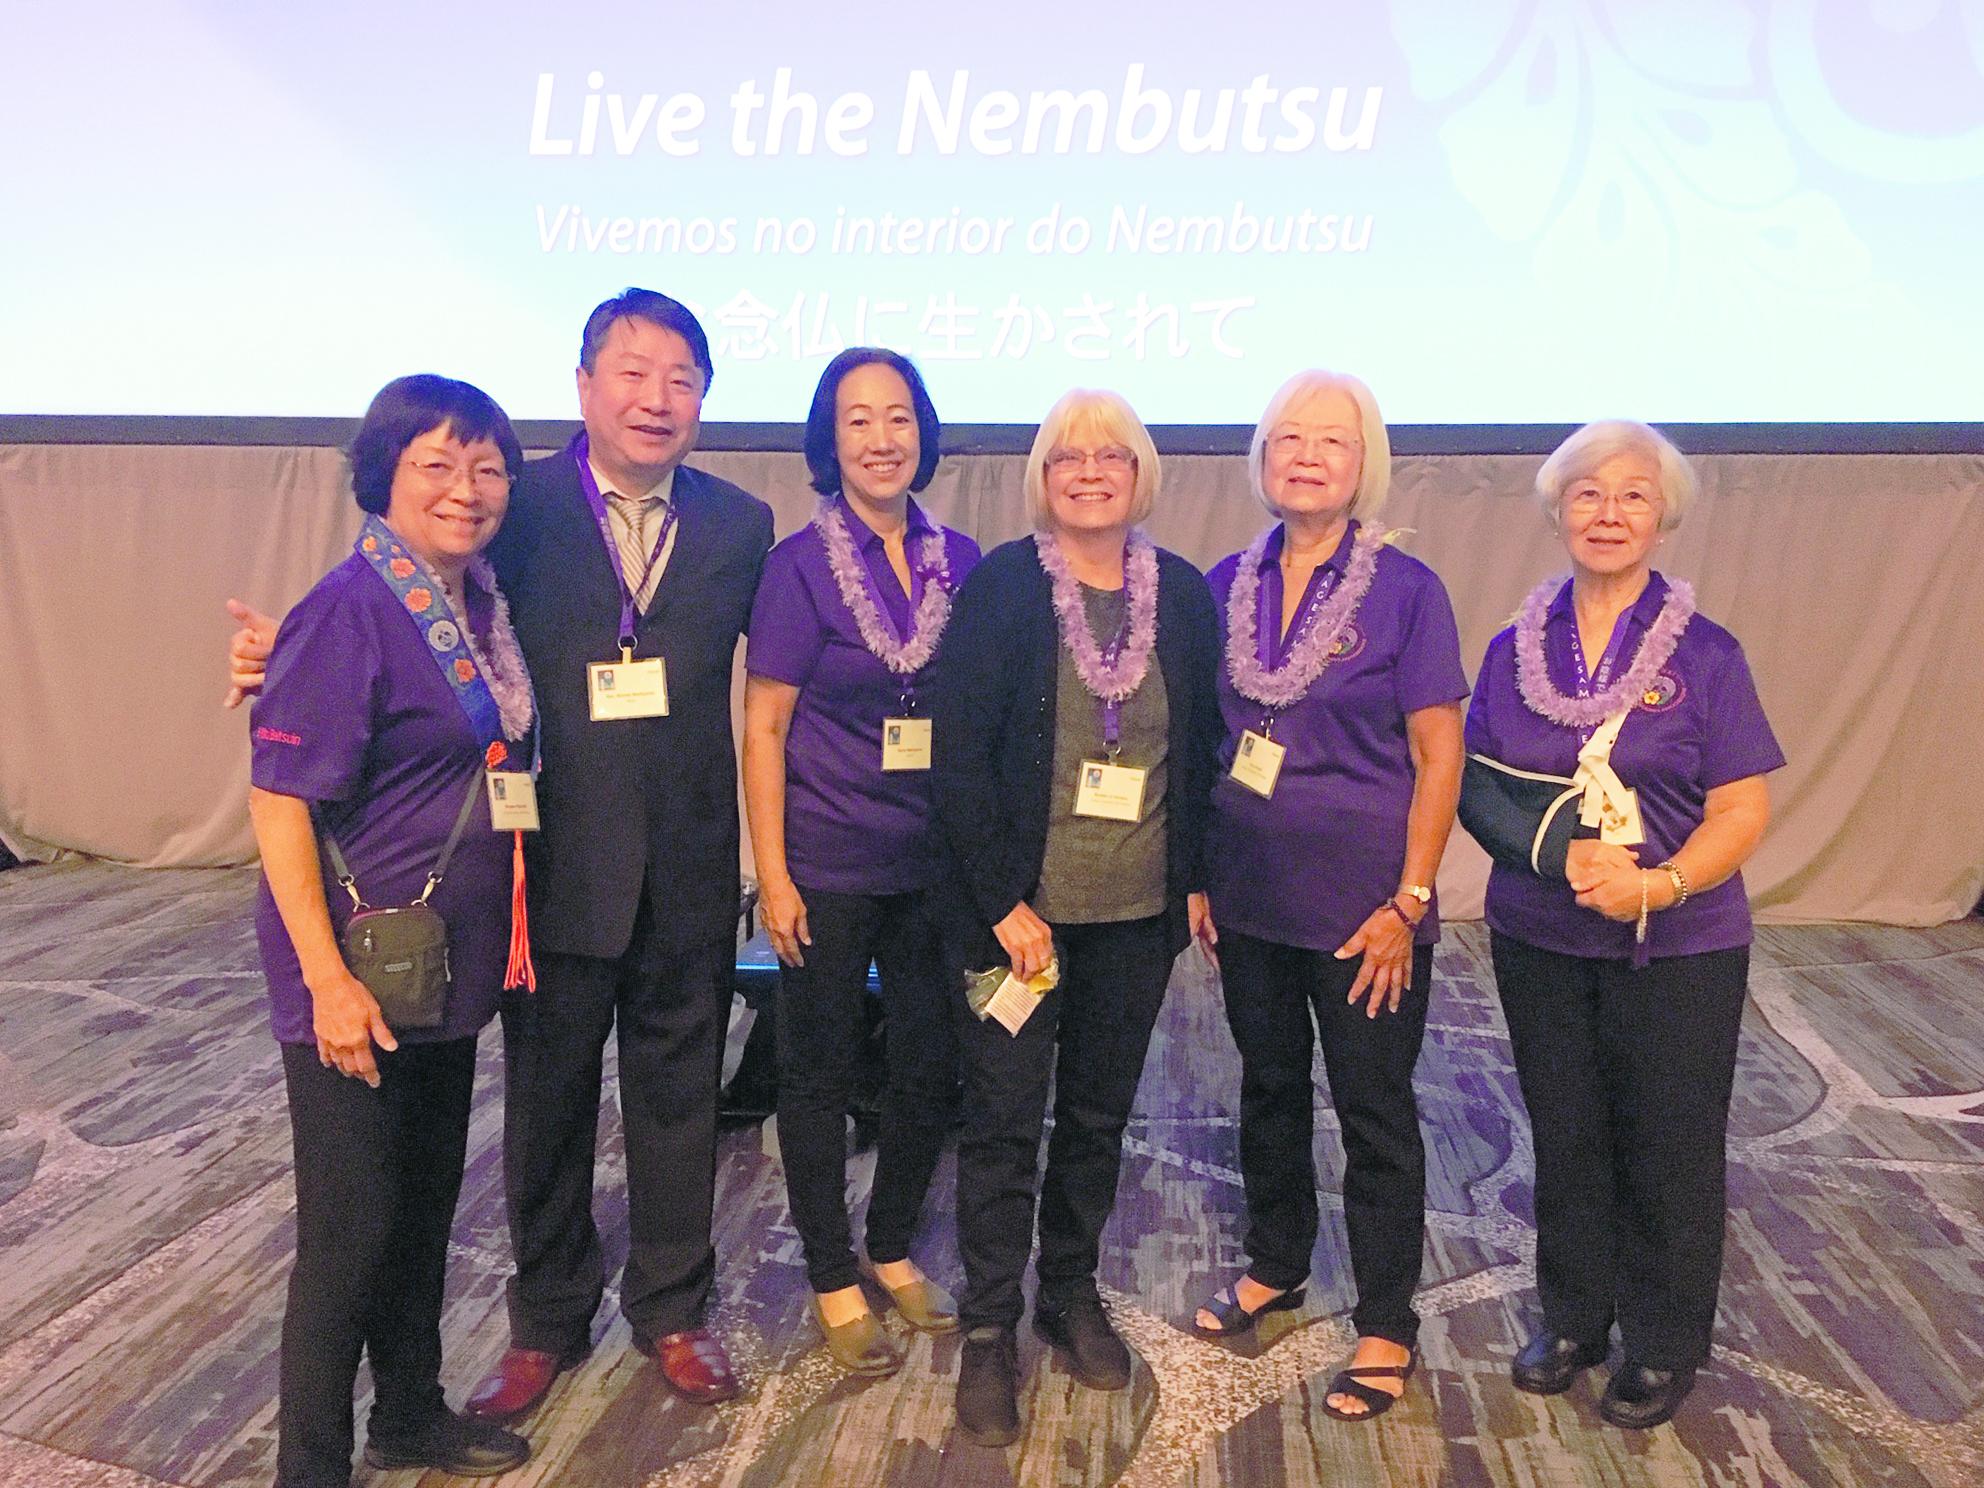 The 2019 World Buddhist Women's Association convention delegation from Hilo (from left): Barbara Fujimoto, Rimban Shindo Nishiyama, Suzy Nishiyama, BJ Soriano, Theo Kushi and Hilo BWA president Carole Tsutsumi. Not pictured: Ellen Okano. (Photo courtesy Jan Higashi)